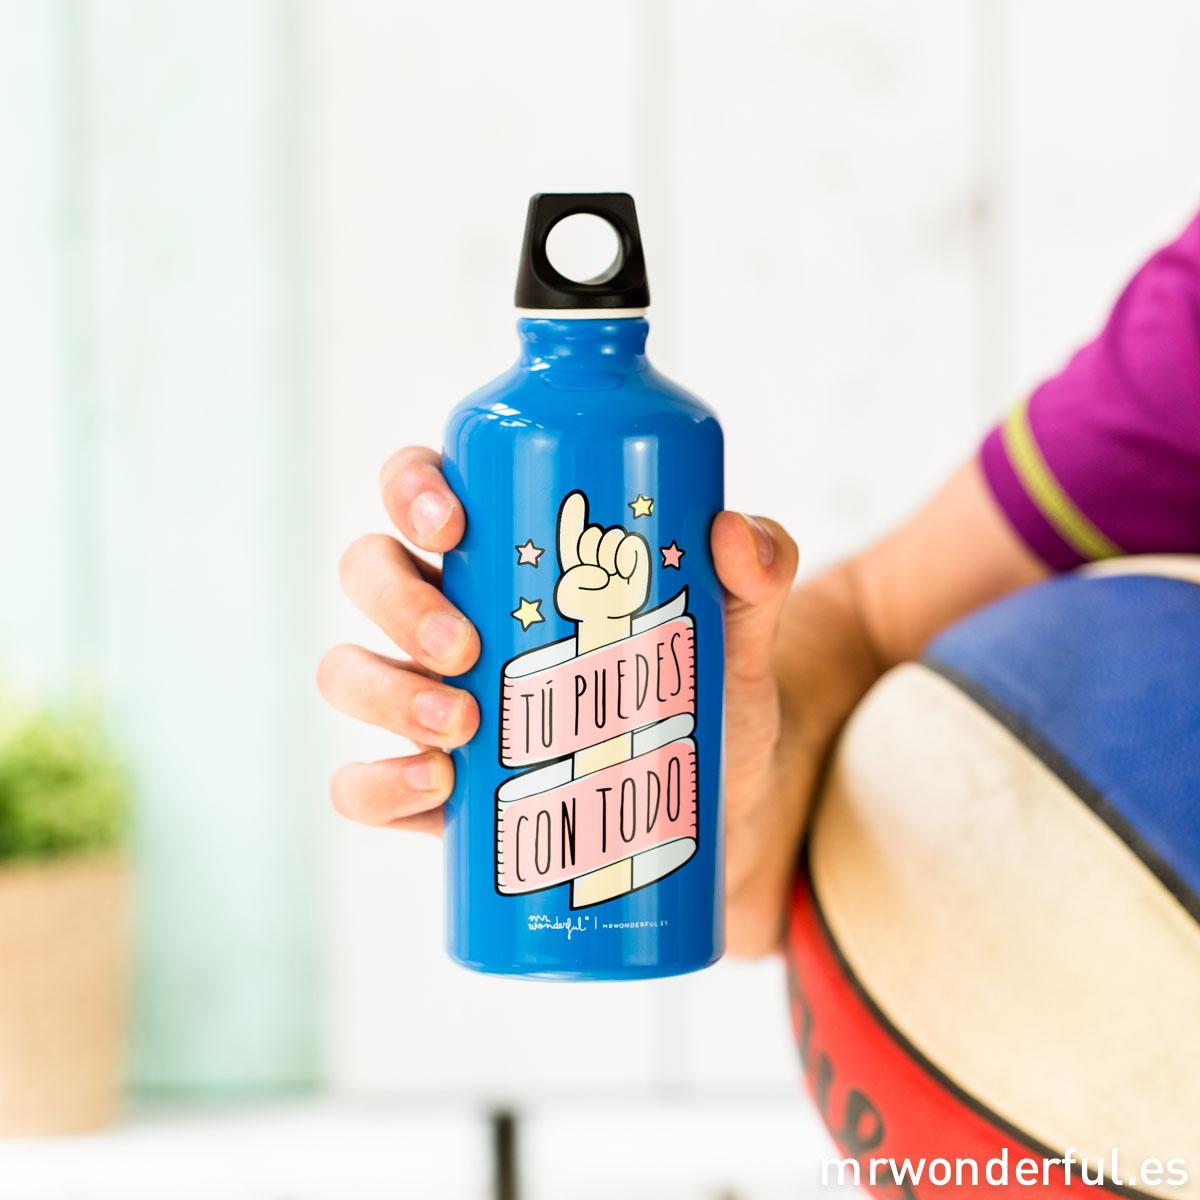 Mrwonderful_BOTELLA02_botella-aluminio-tu-puedes-con-todo-23